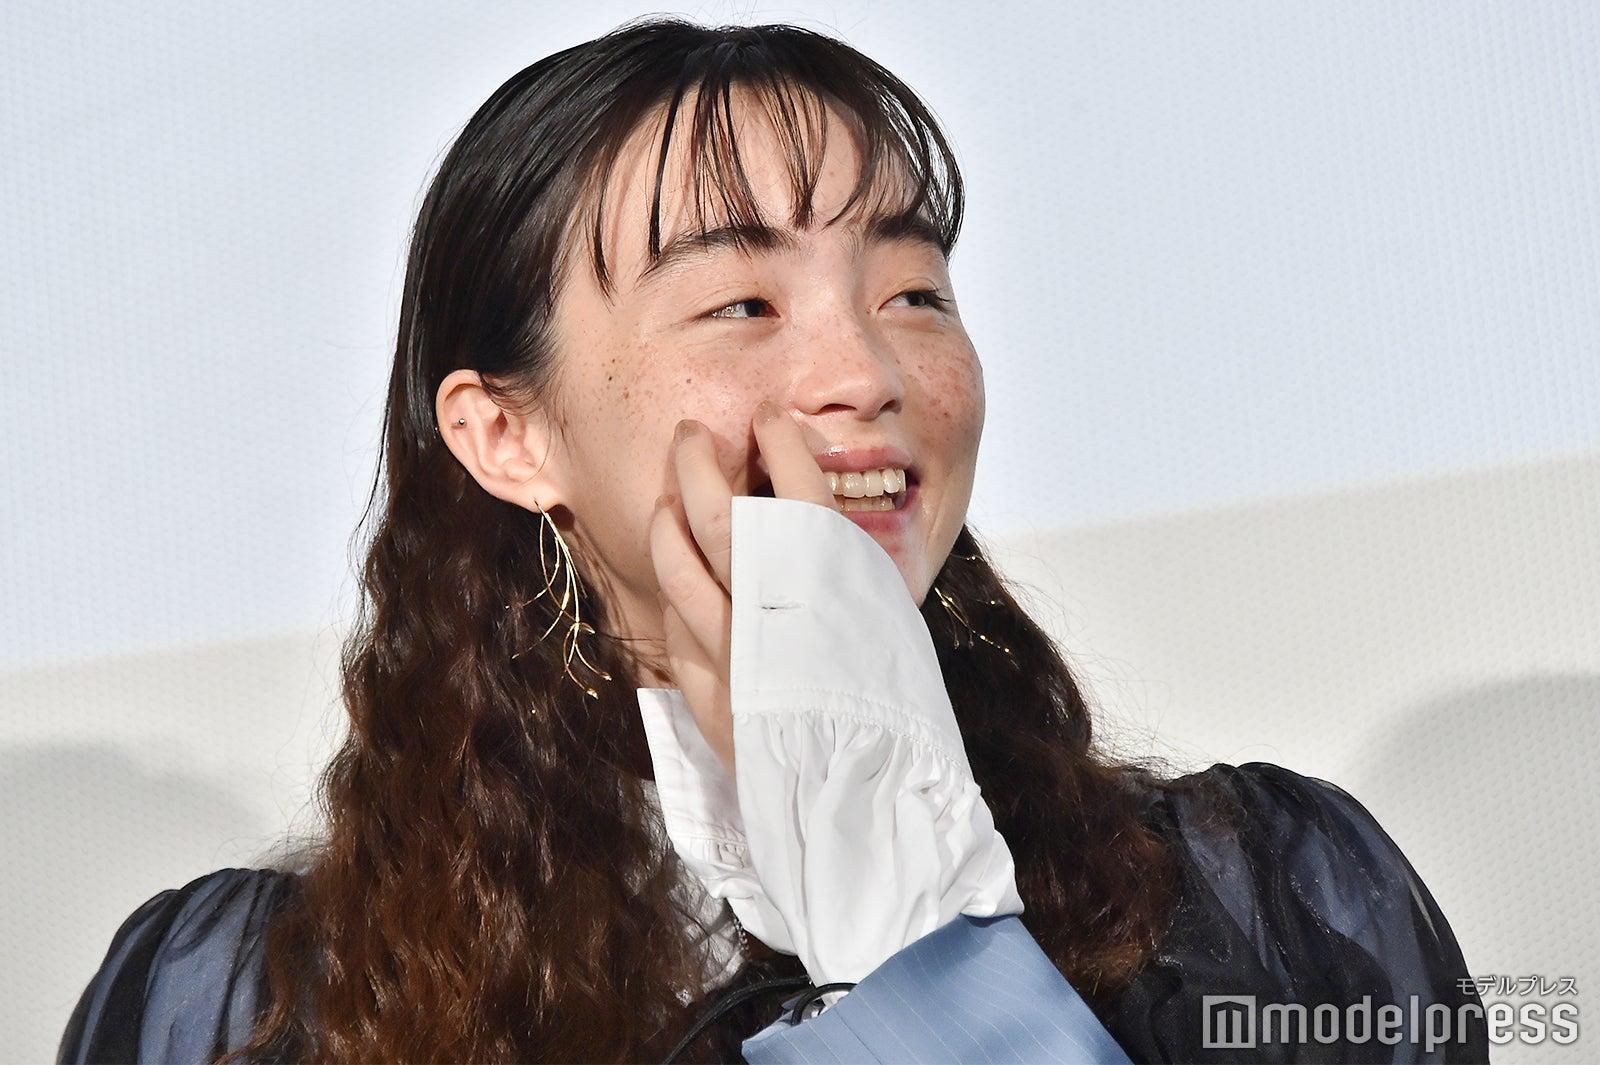 歯並び 佐藤健